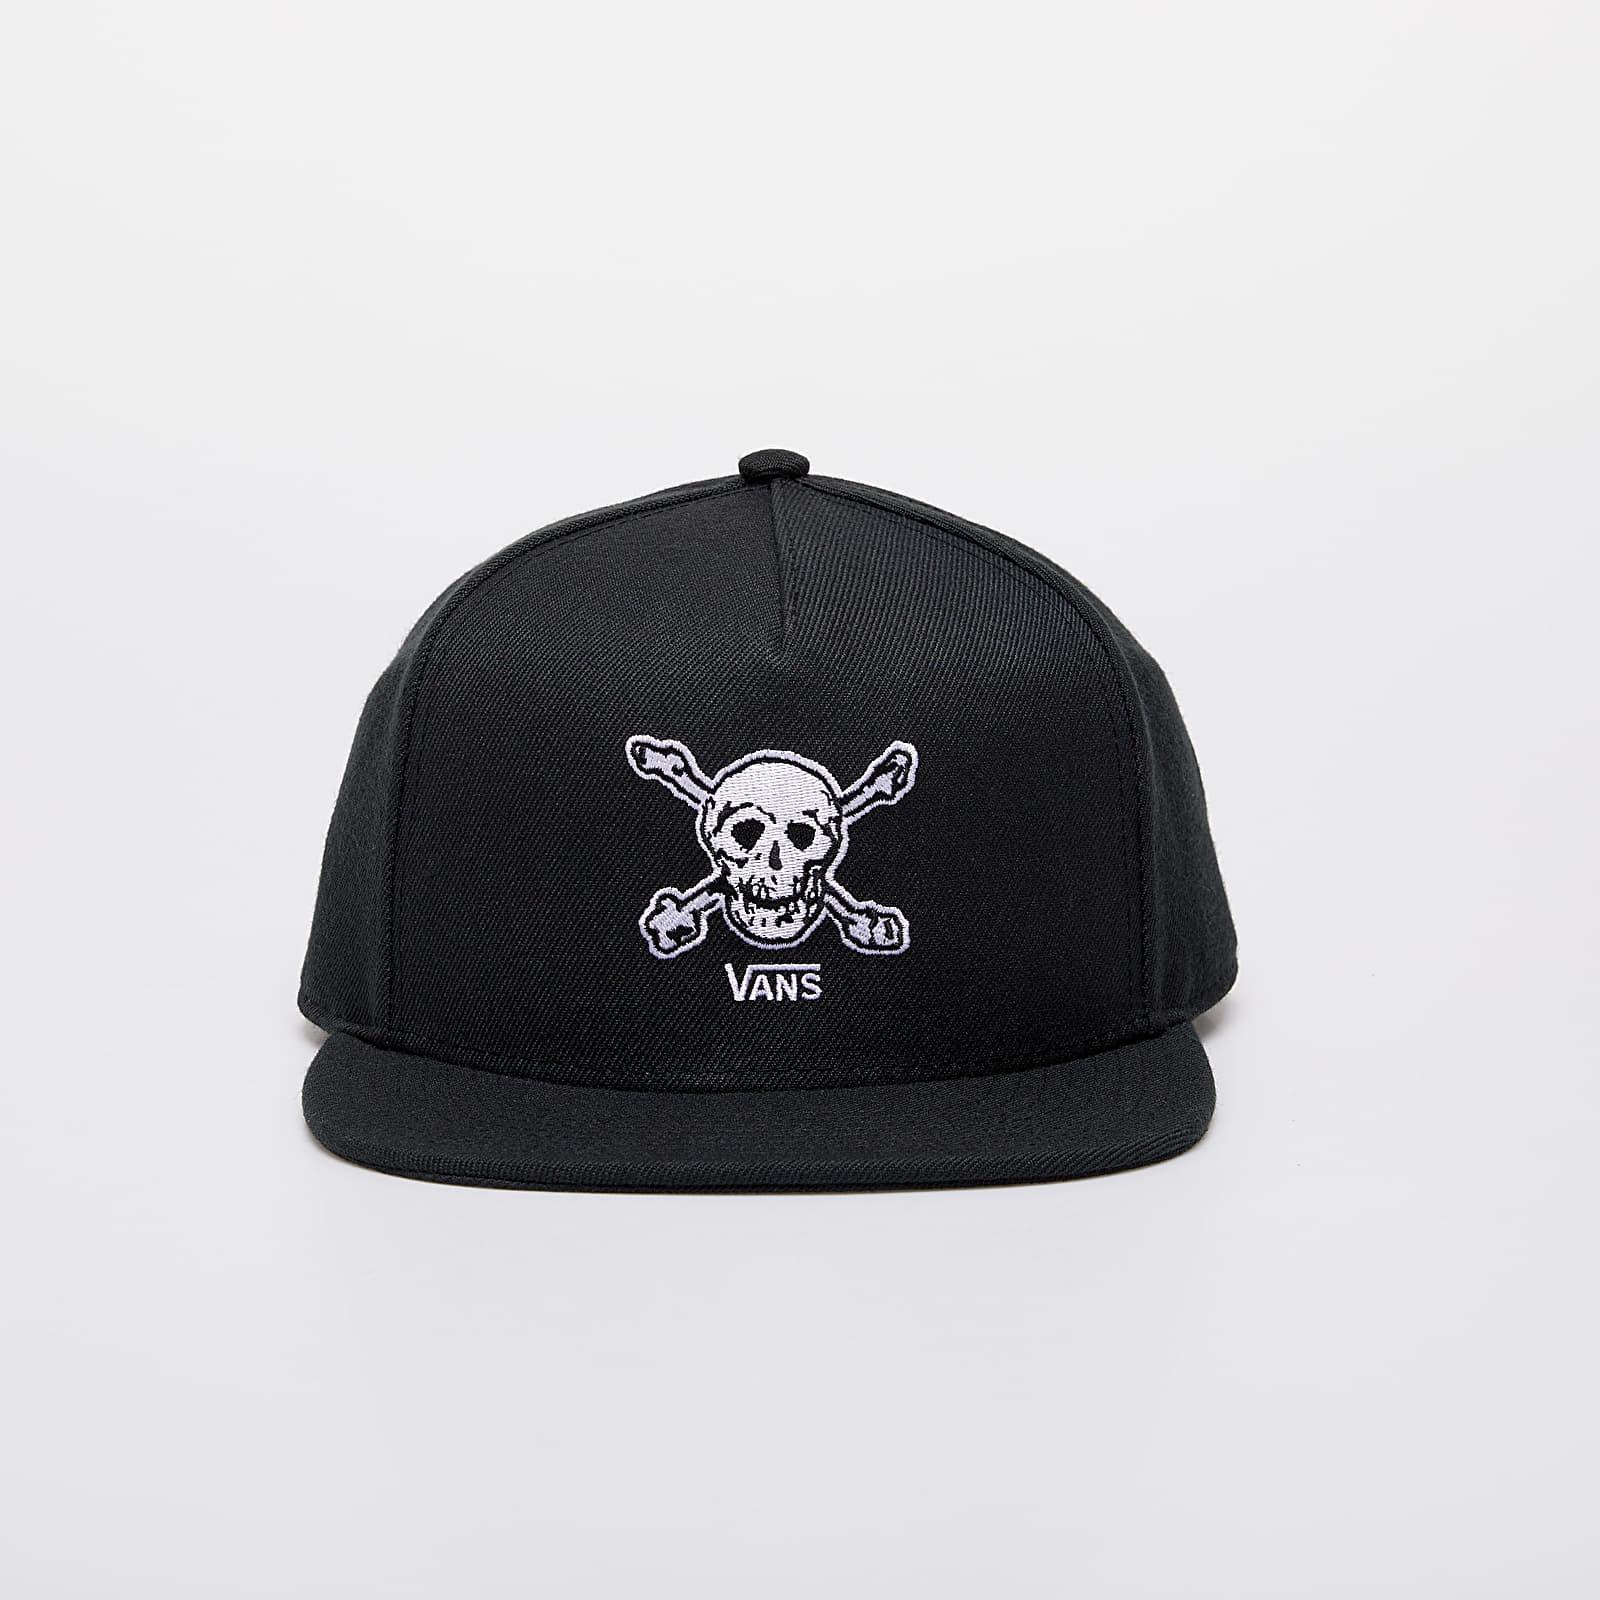 Caps Vans Anaheim Skull Snapback Black